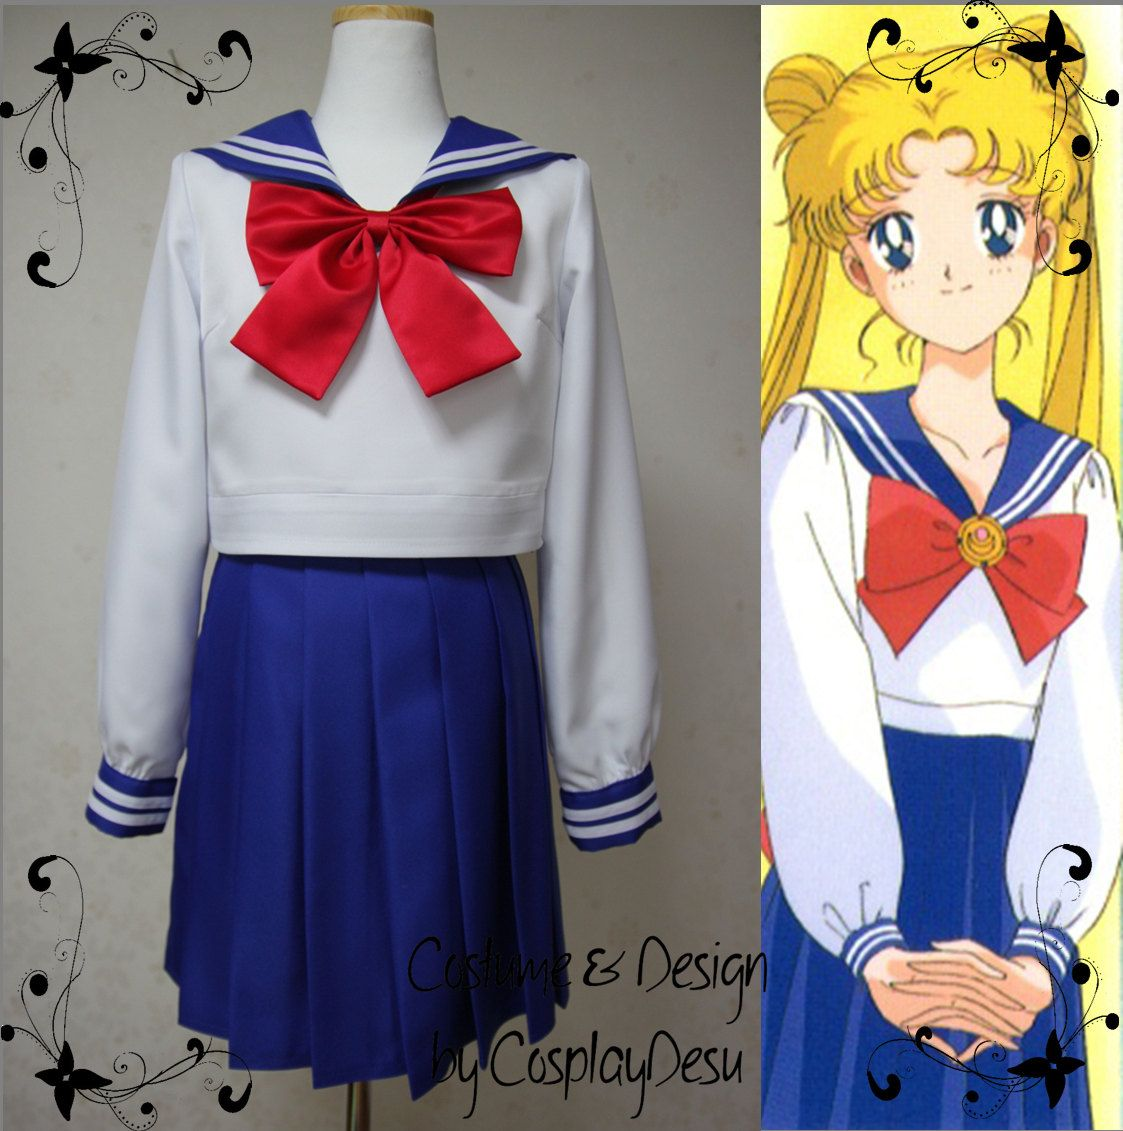 0d37eef1f67 Sailor moon blue school uniform cosplay outfit for Usagi Tsukino (Sailor  moon) and Ami Mizuno (Sailor Mercury).  145.00